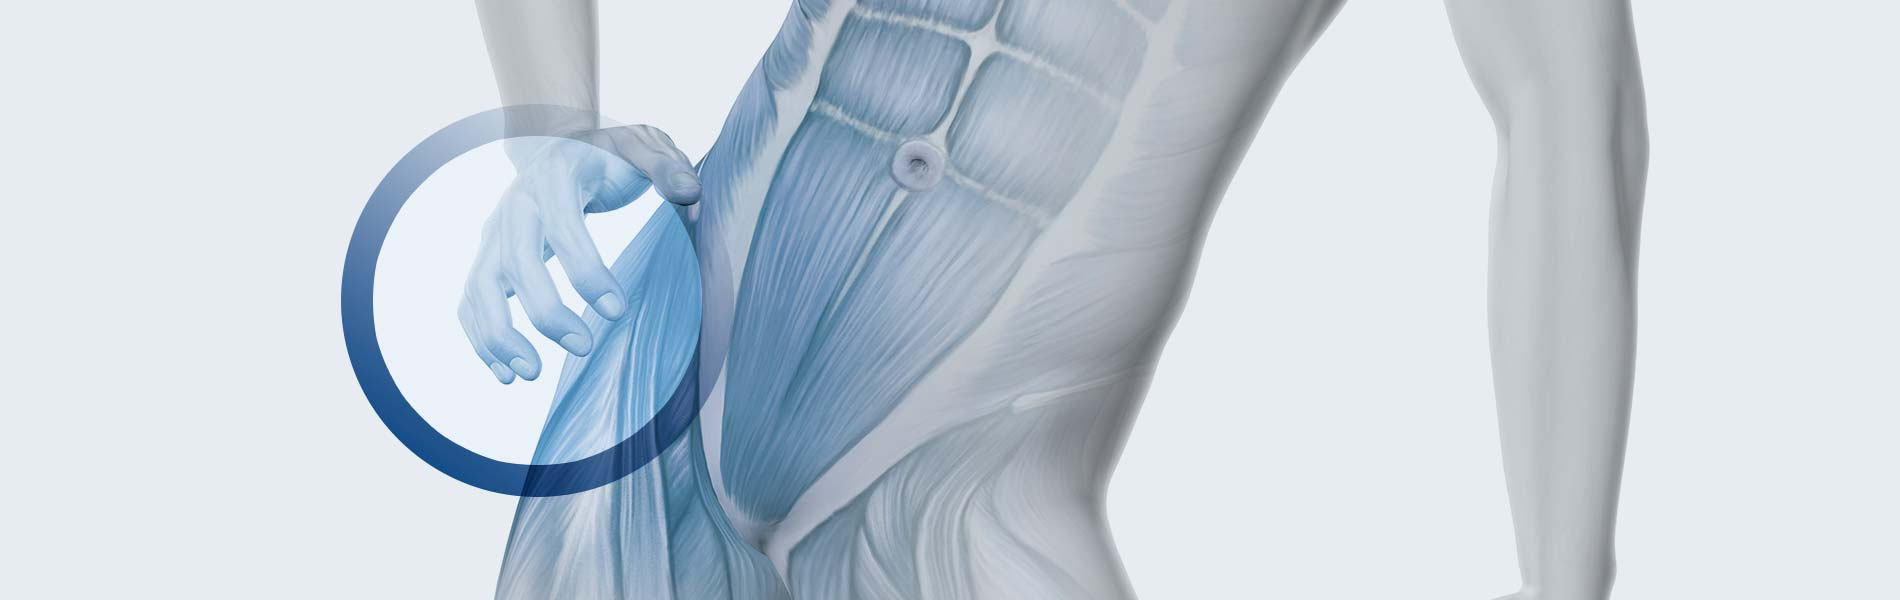 Total Hip Replacement Surgery Procedure